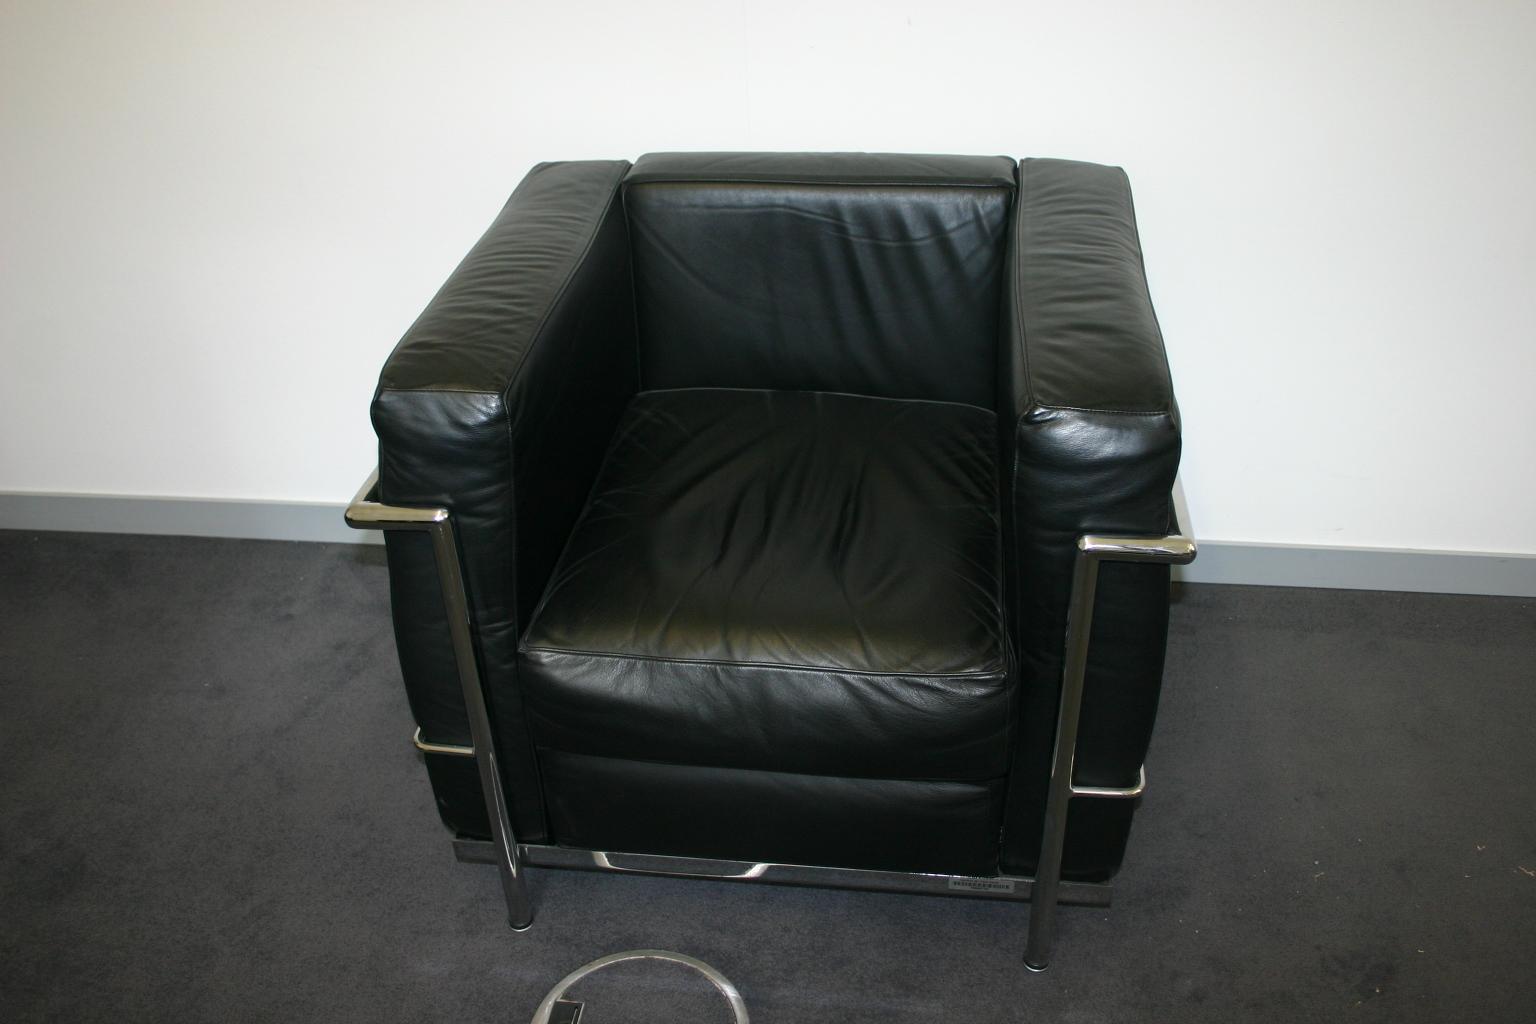 Eleganter sessel in schwarzem leder le corbusier nachbau for Corbusier nachbau